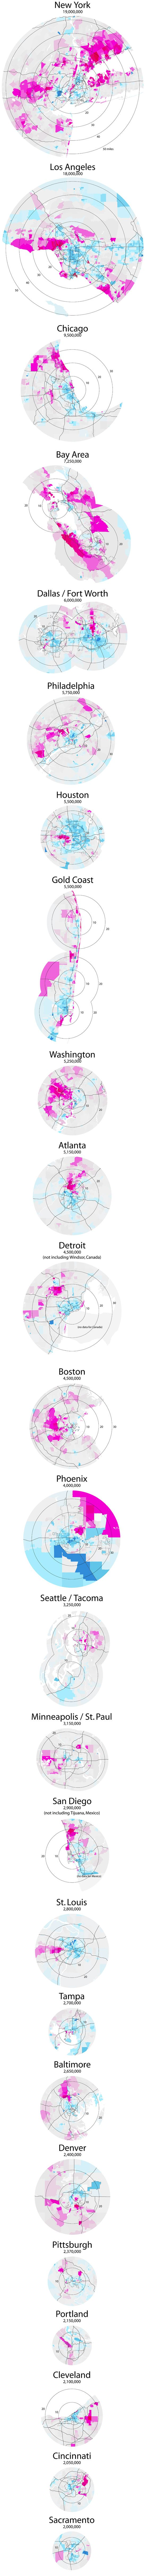 Best Per Capita Income Ideas On Pinterest - Richest us counties per capita